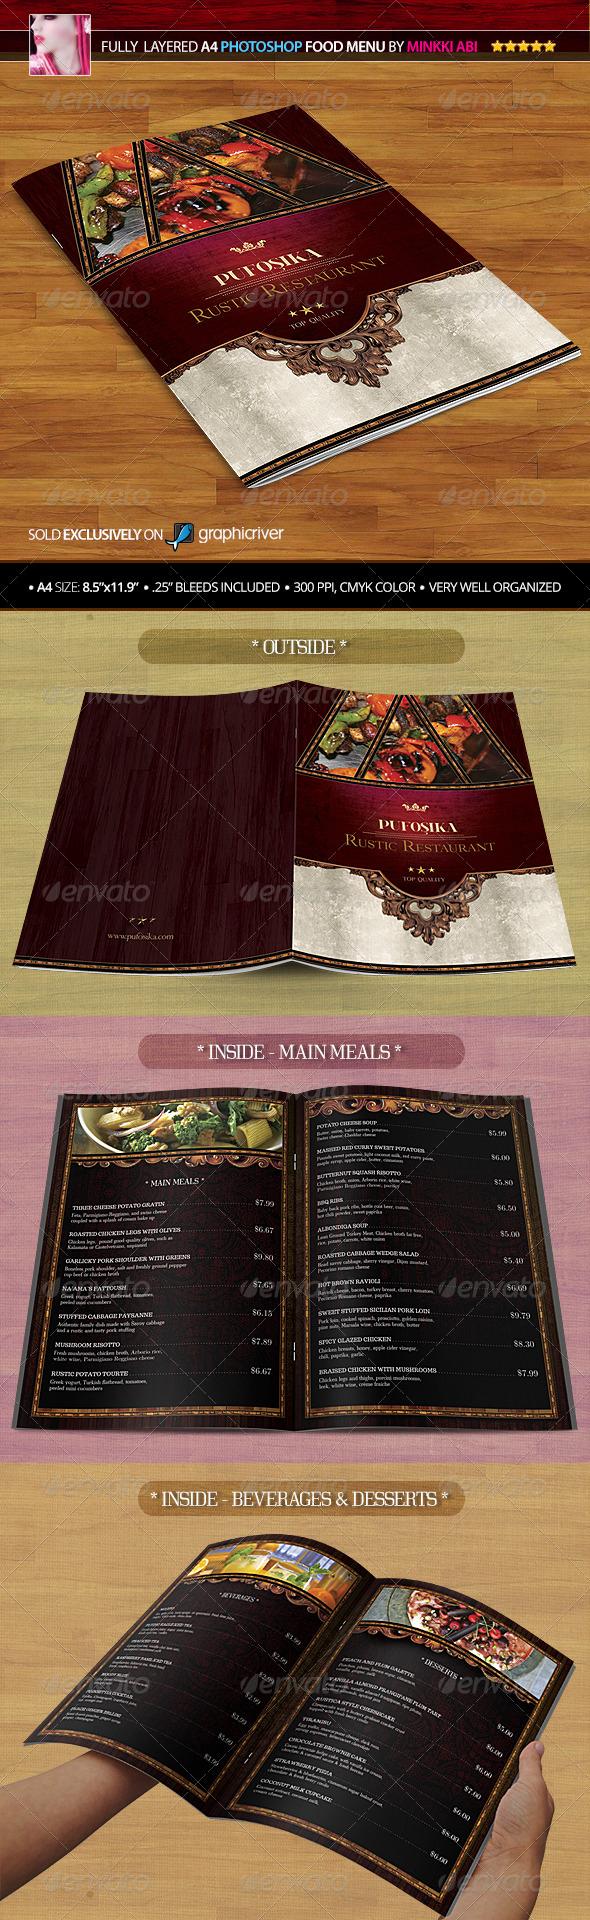 A4 Rustic Restaurant Food Menu - Food Menus Print Templates